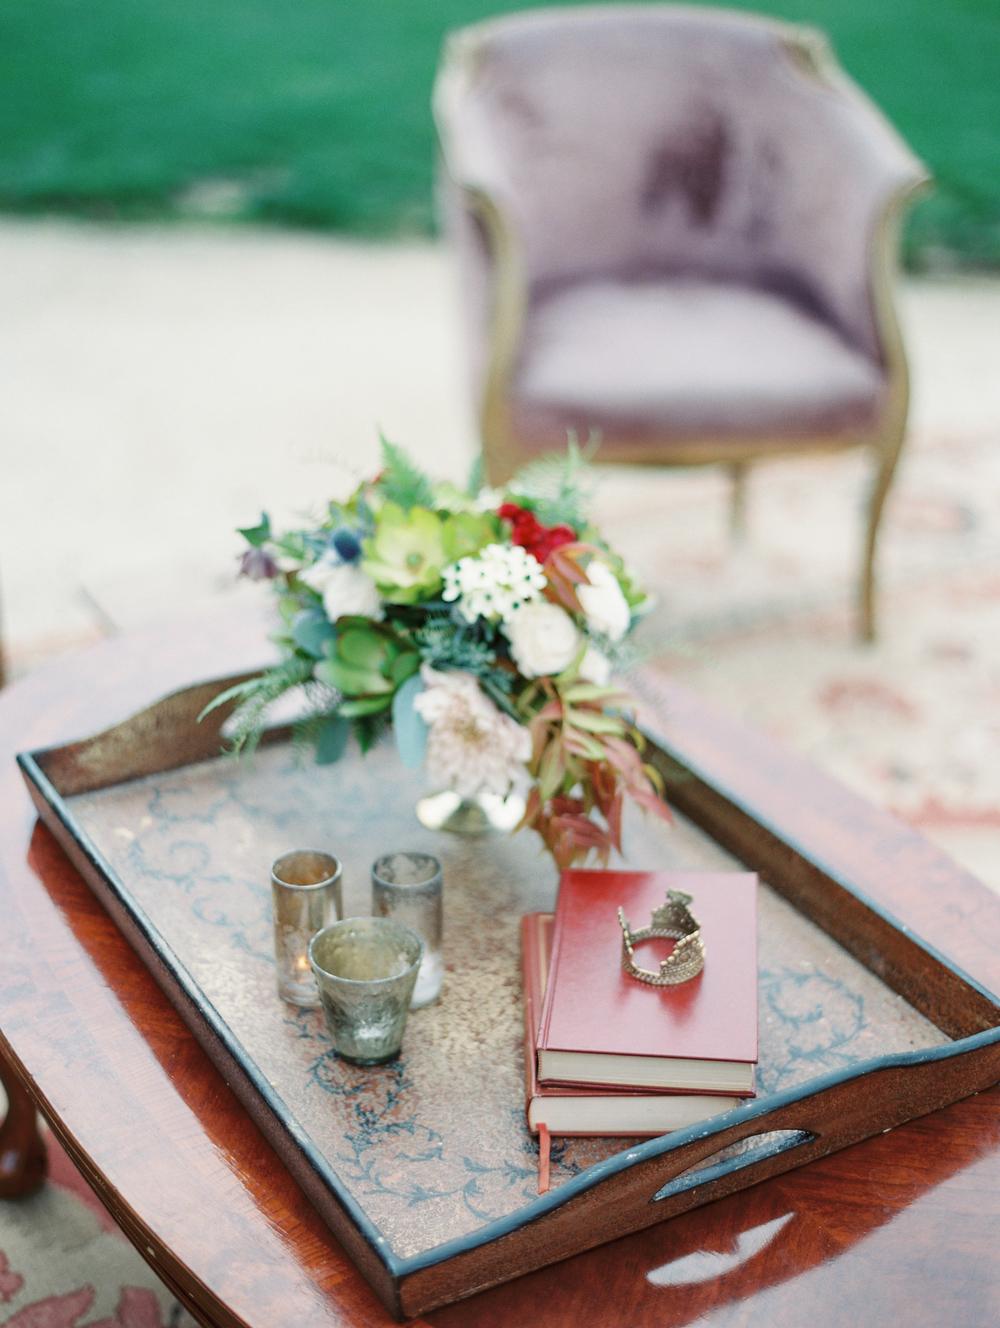 JENNIFER-SKOG-dane-nate-santa-lucia-preserve-wedding-0515.jpg